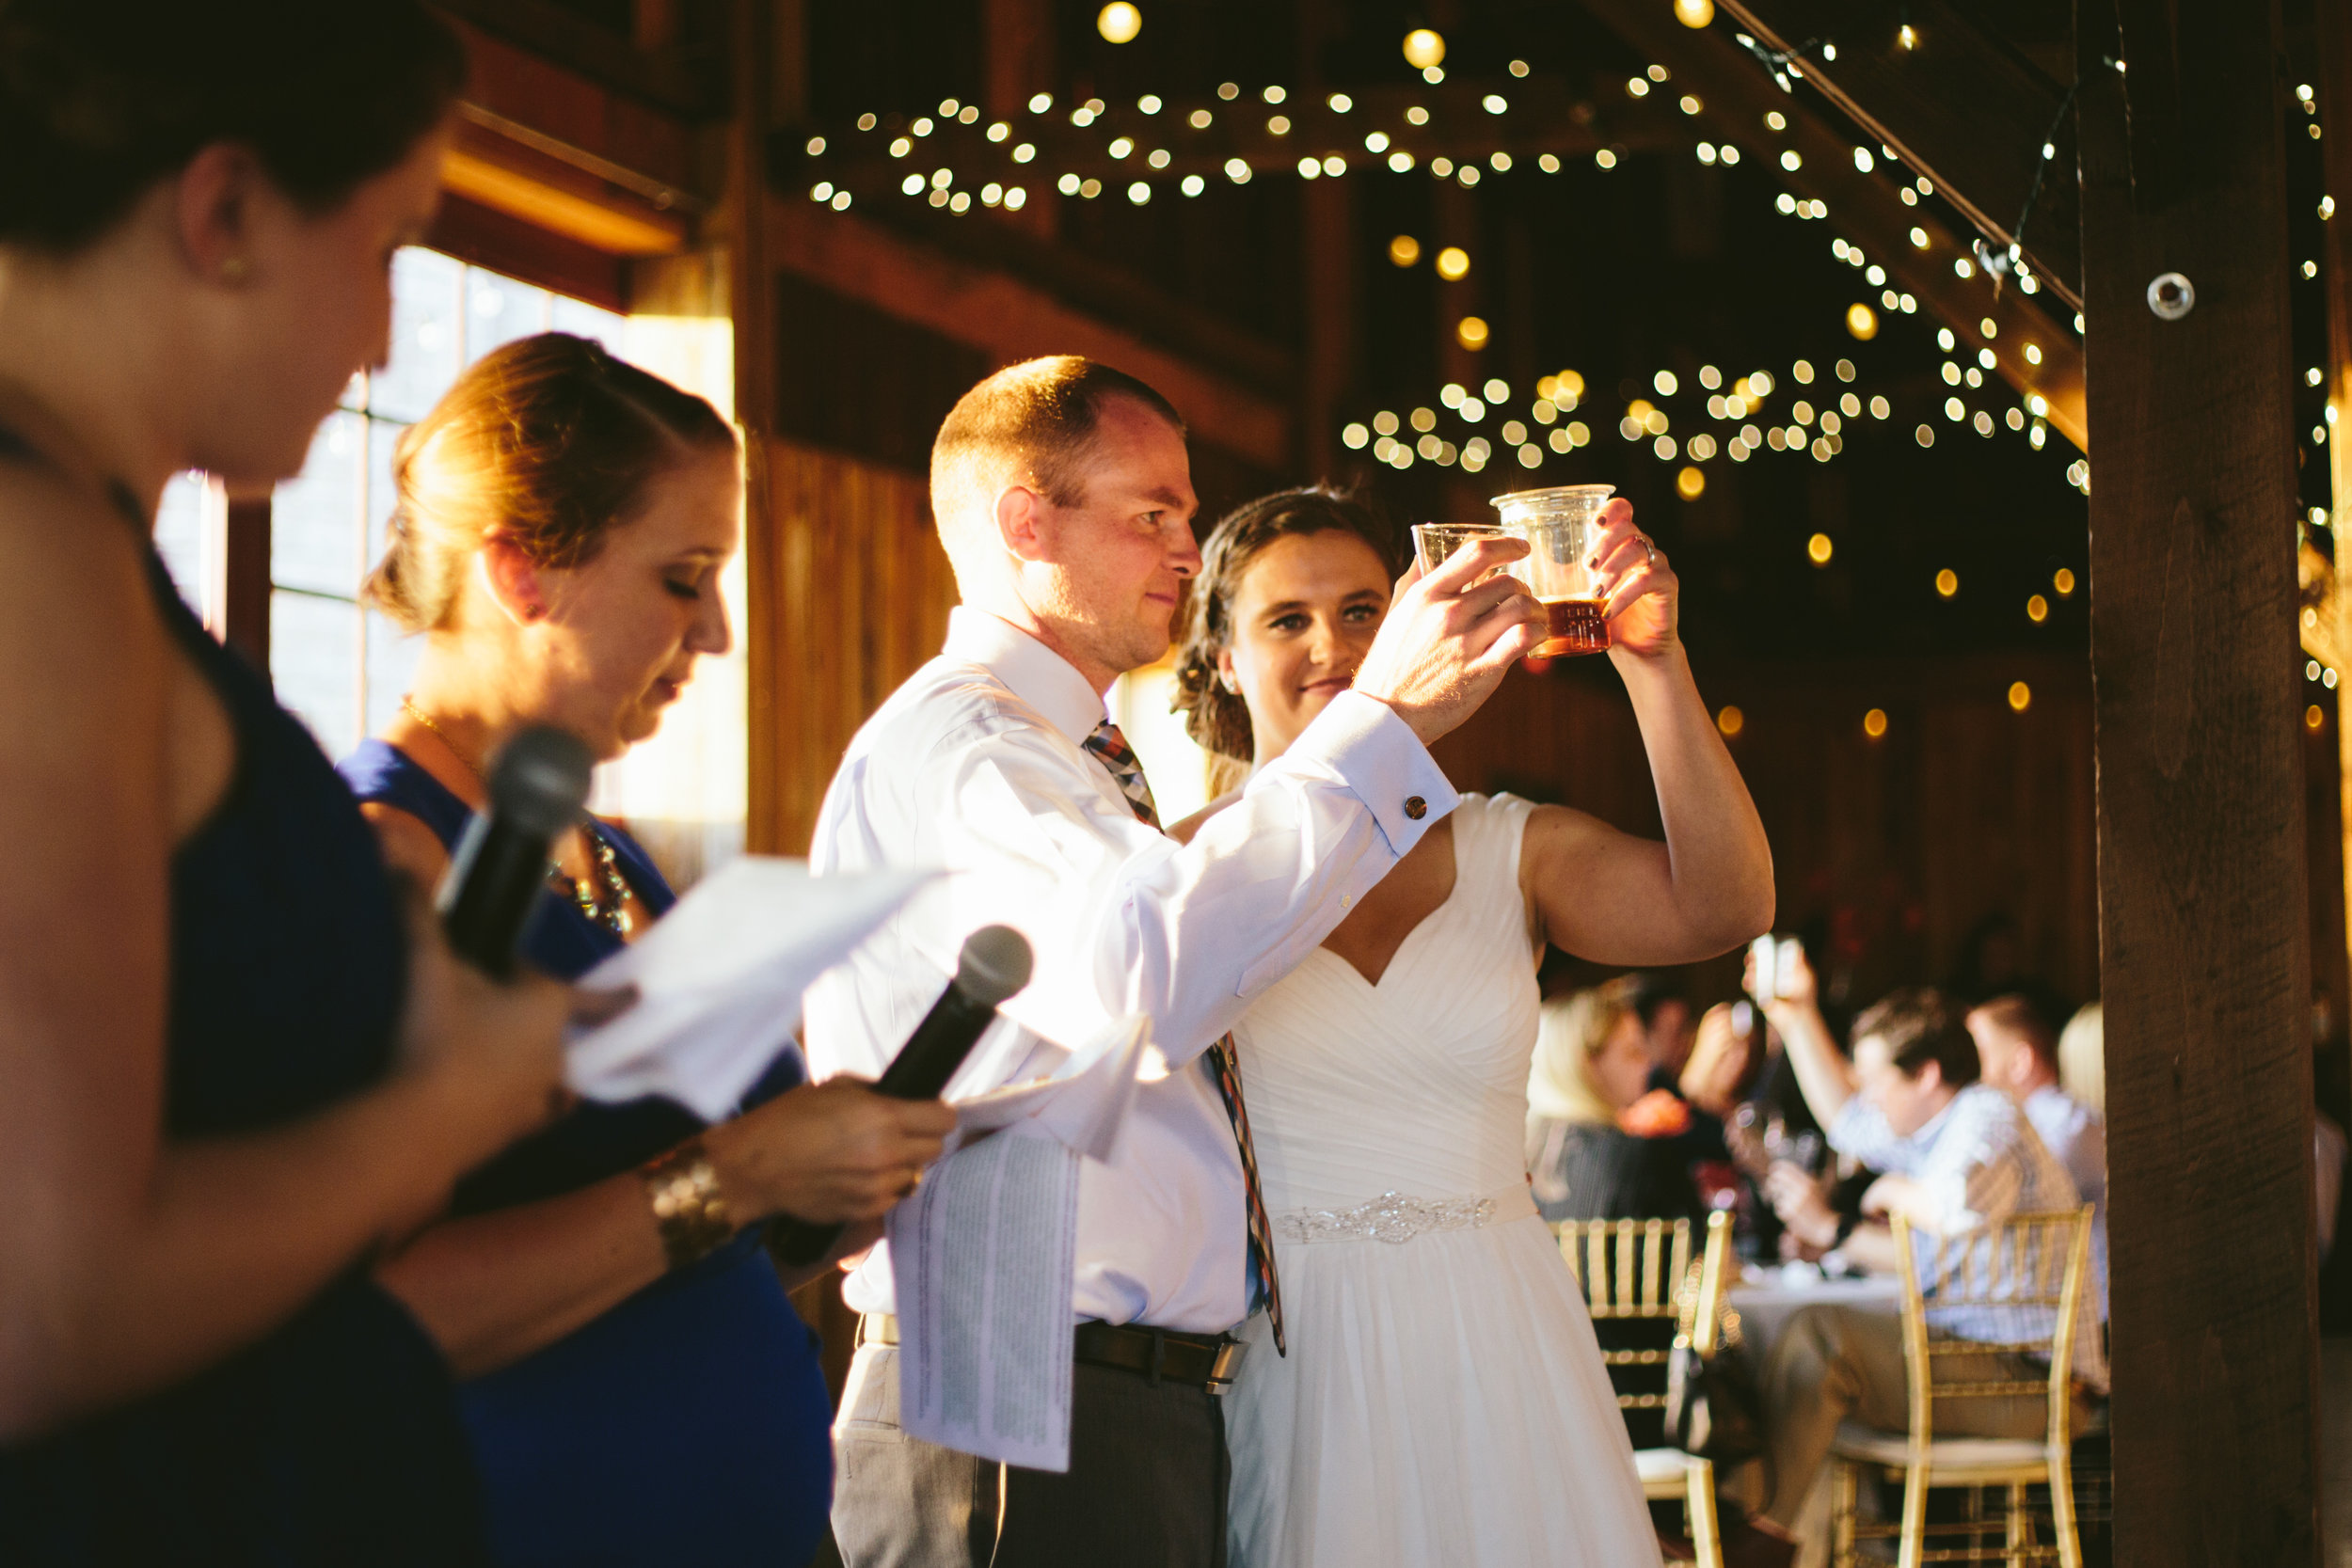 Whitesell-Mattioda Wedding-827.jpg